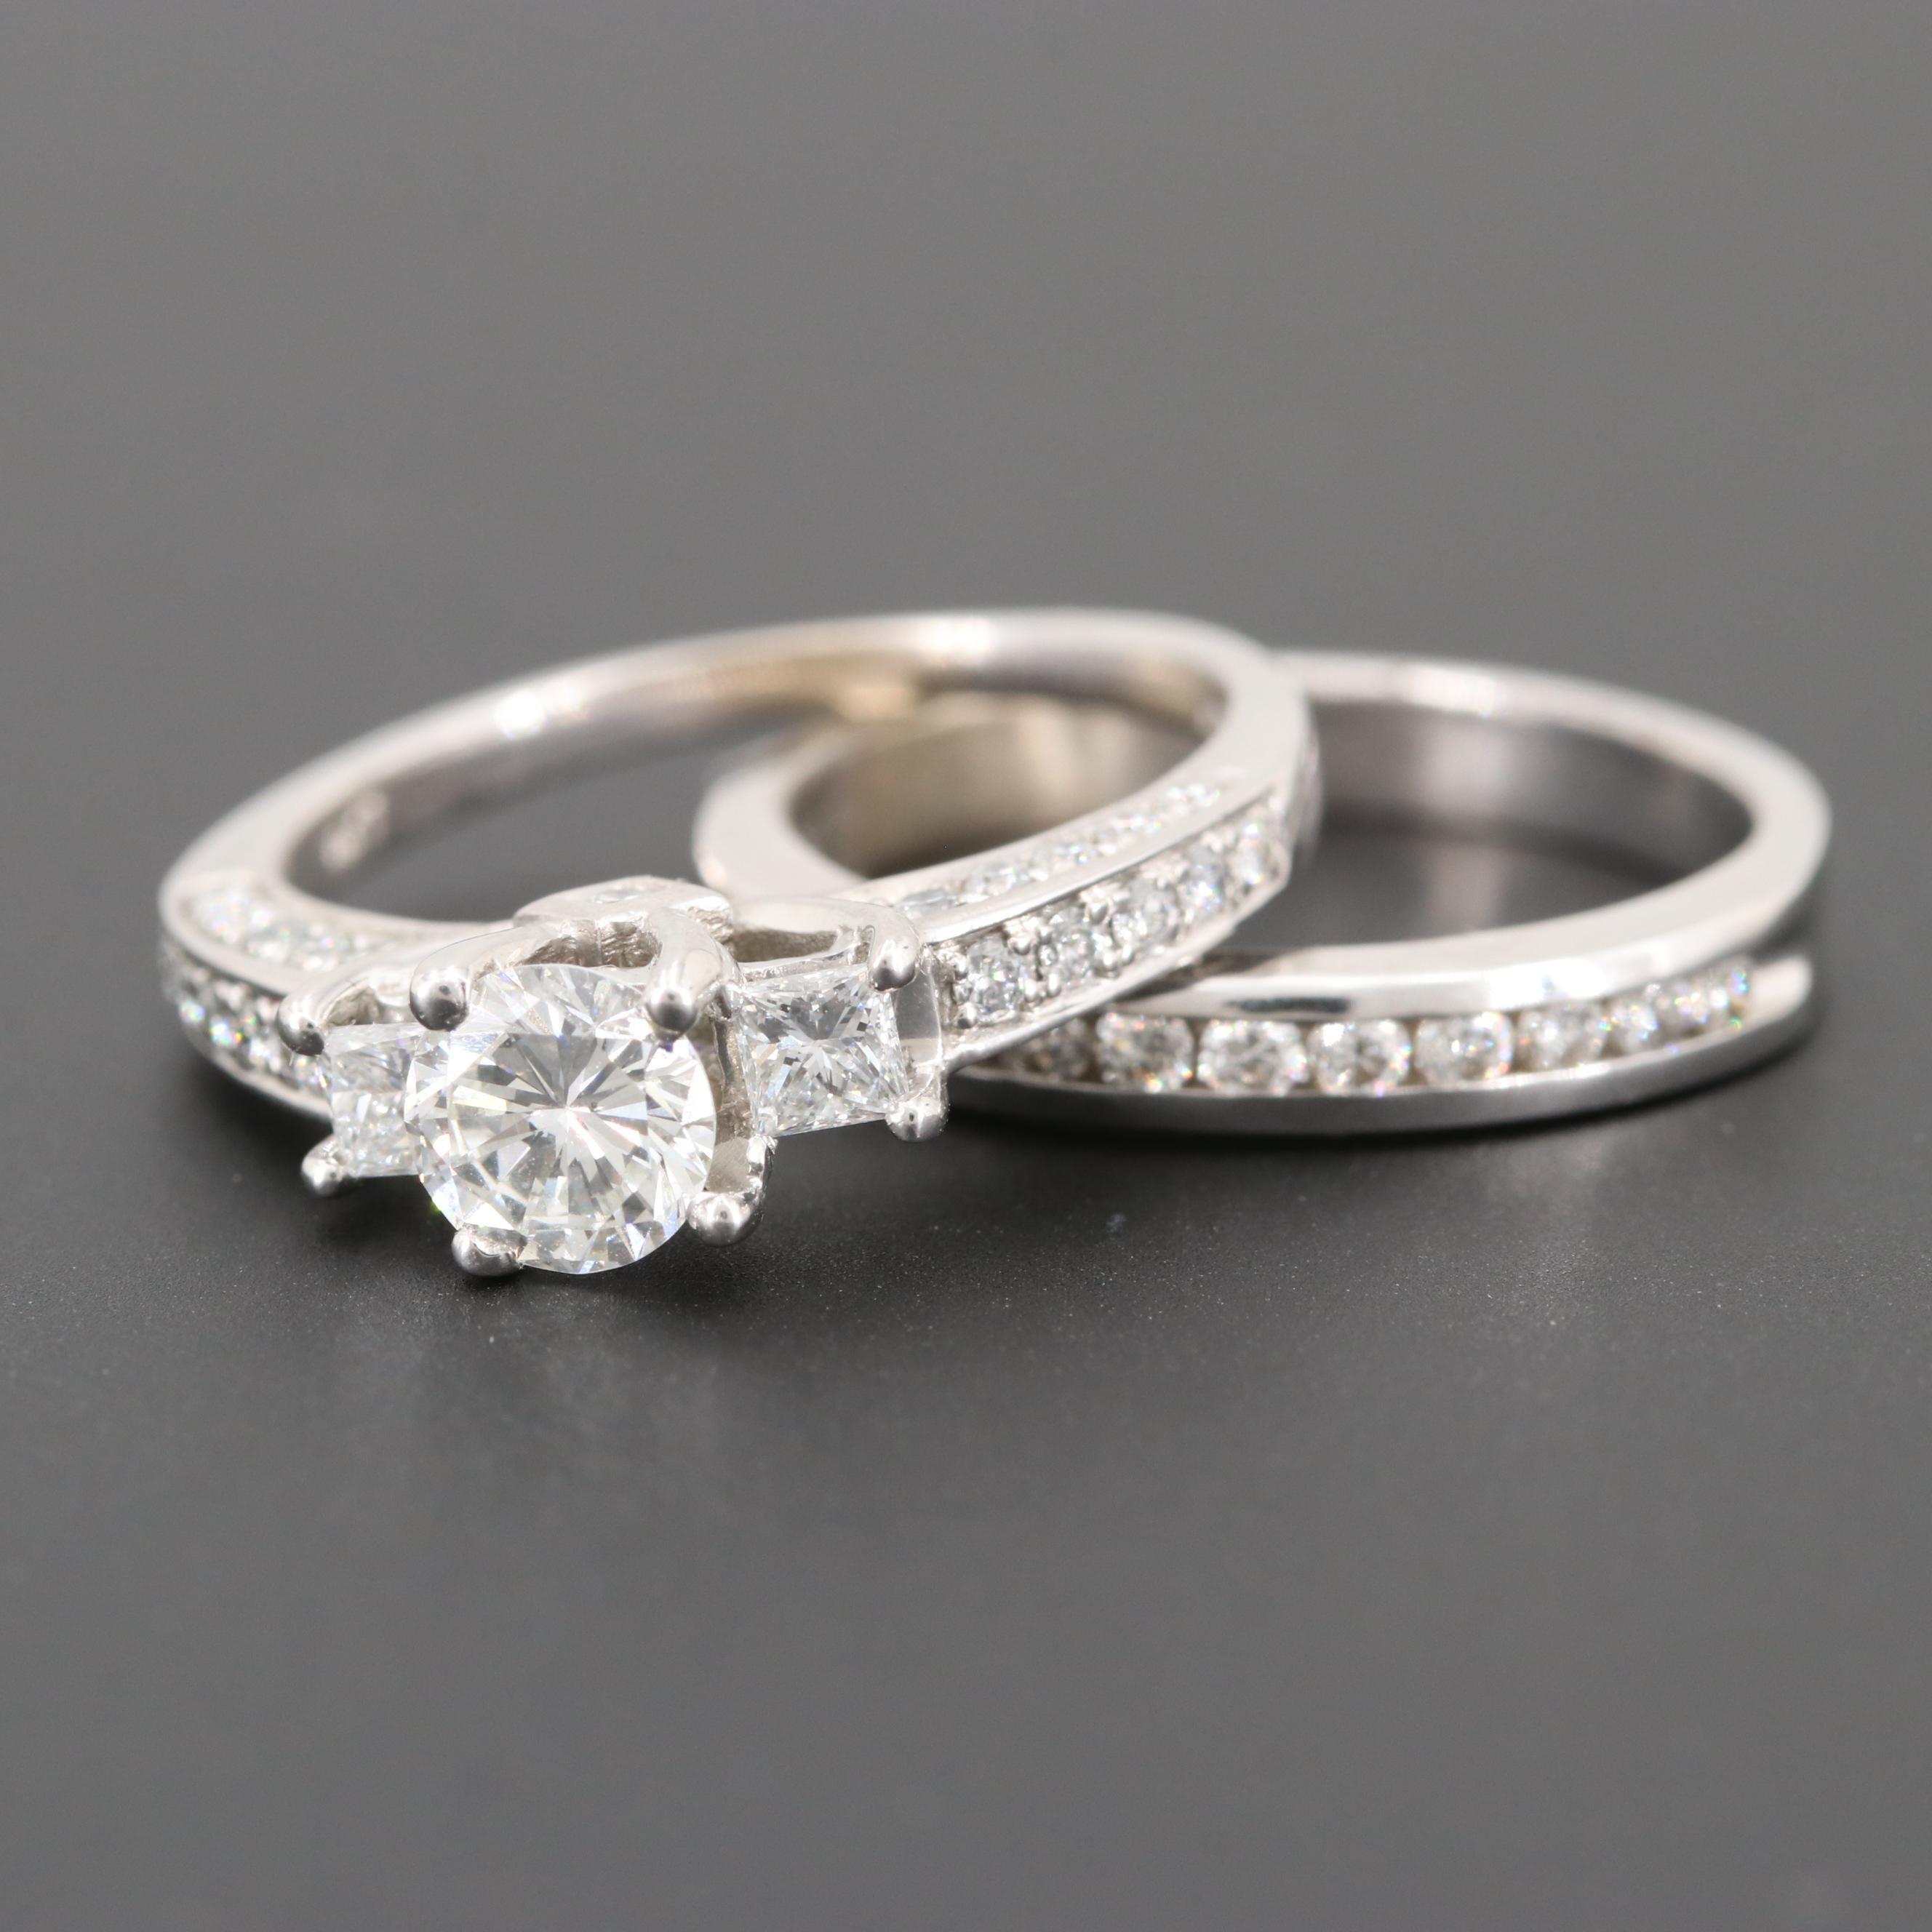 14K White Gold 1.08 CTW Diamond Ring Set